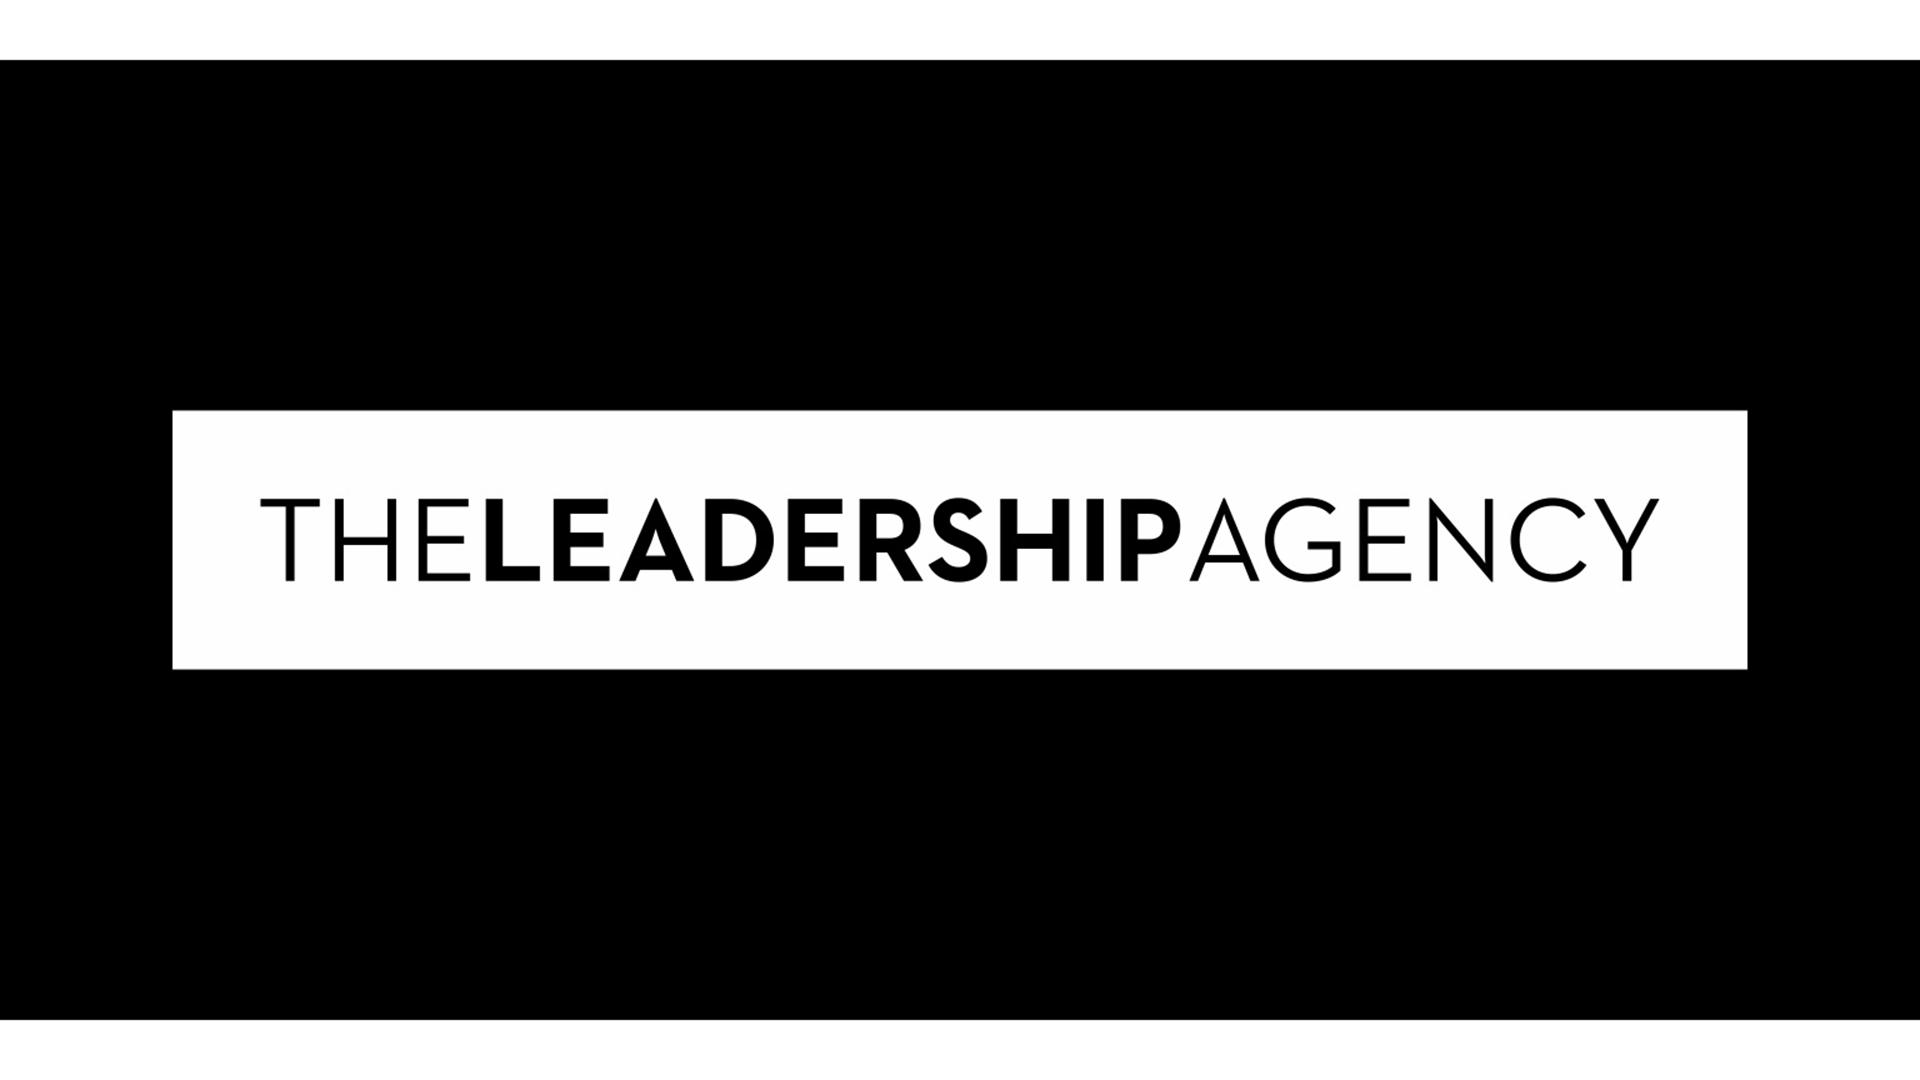 The Leadership Agency